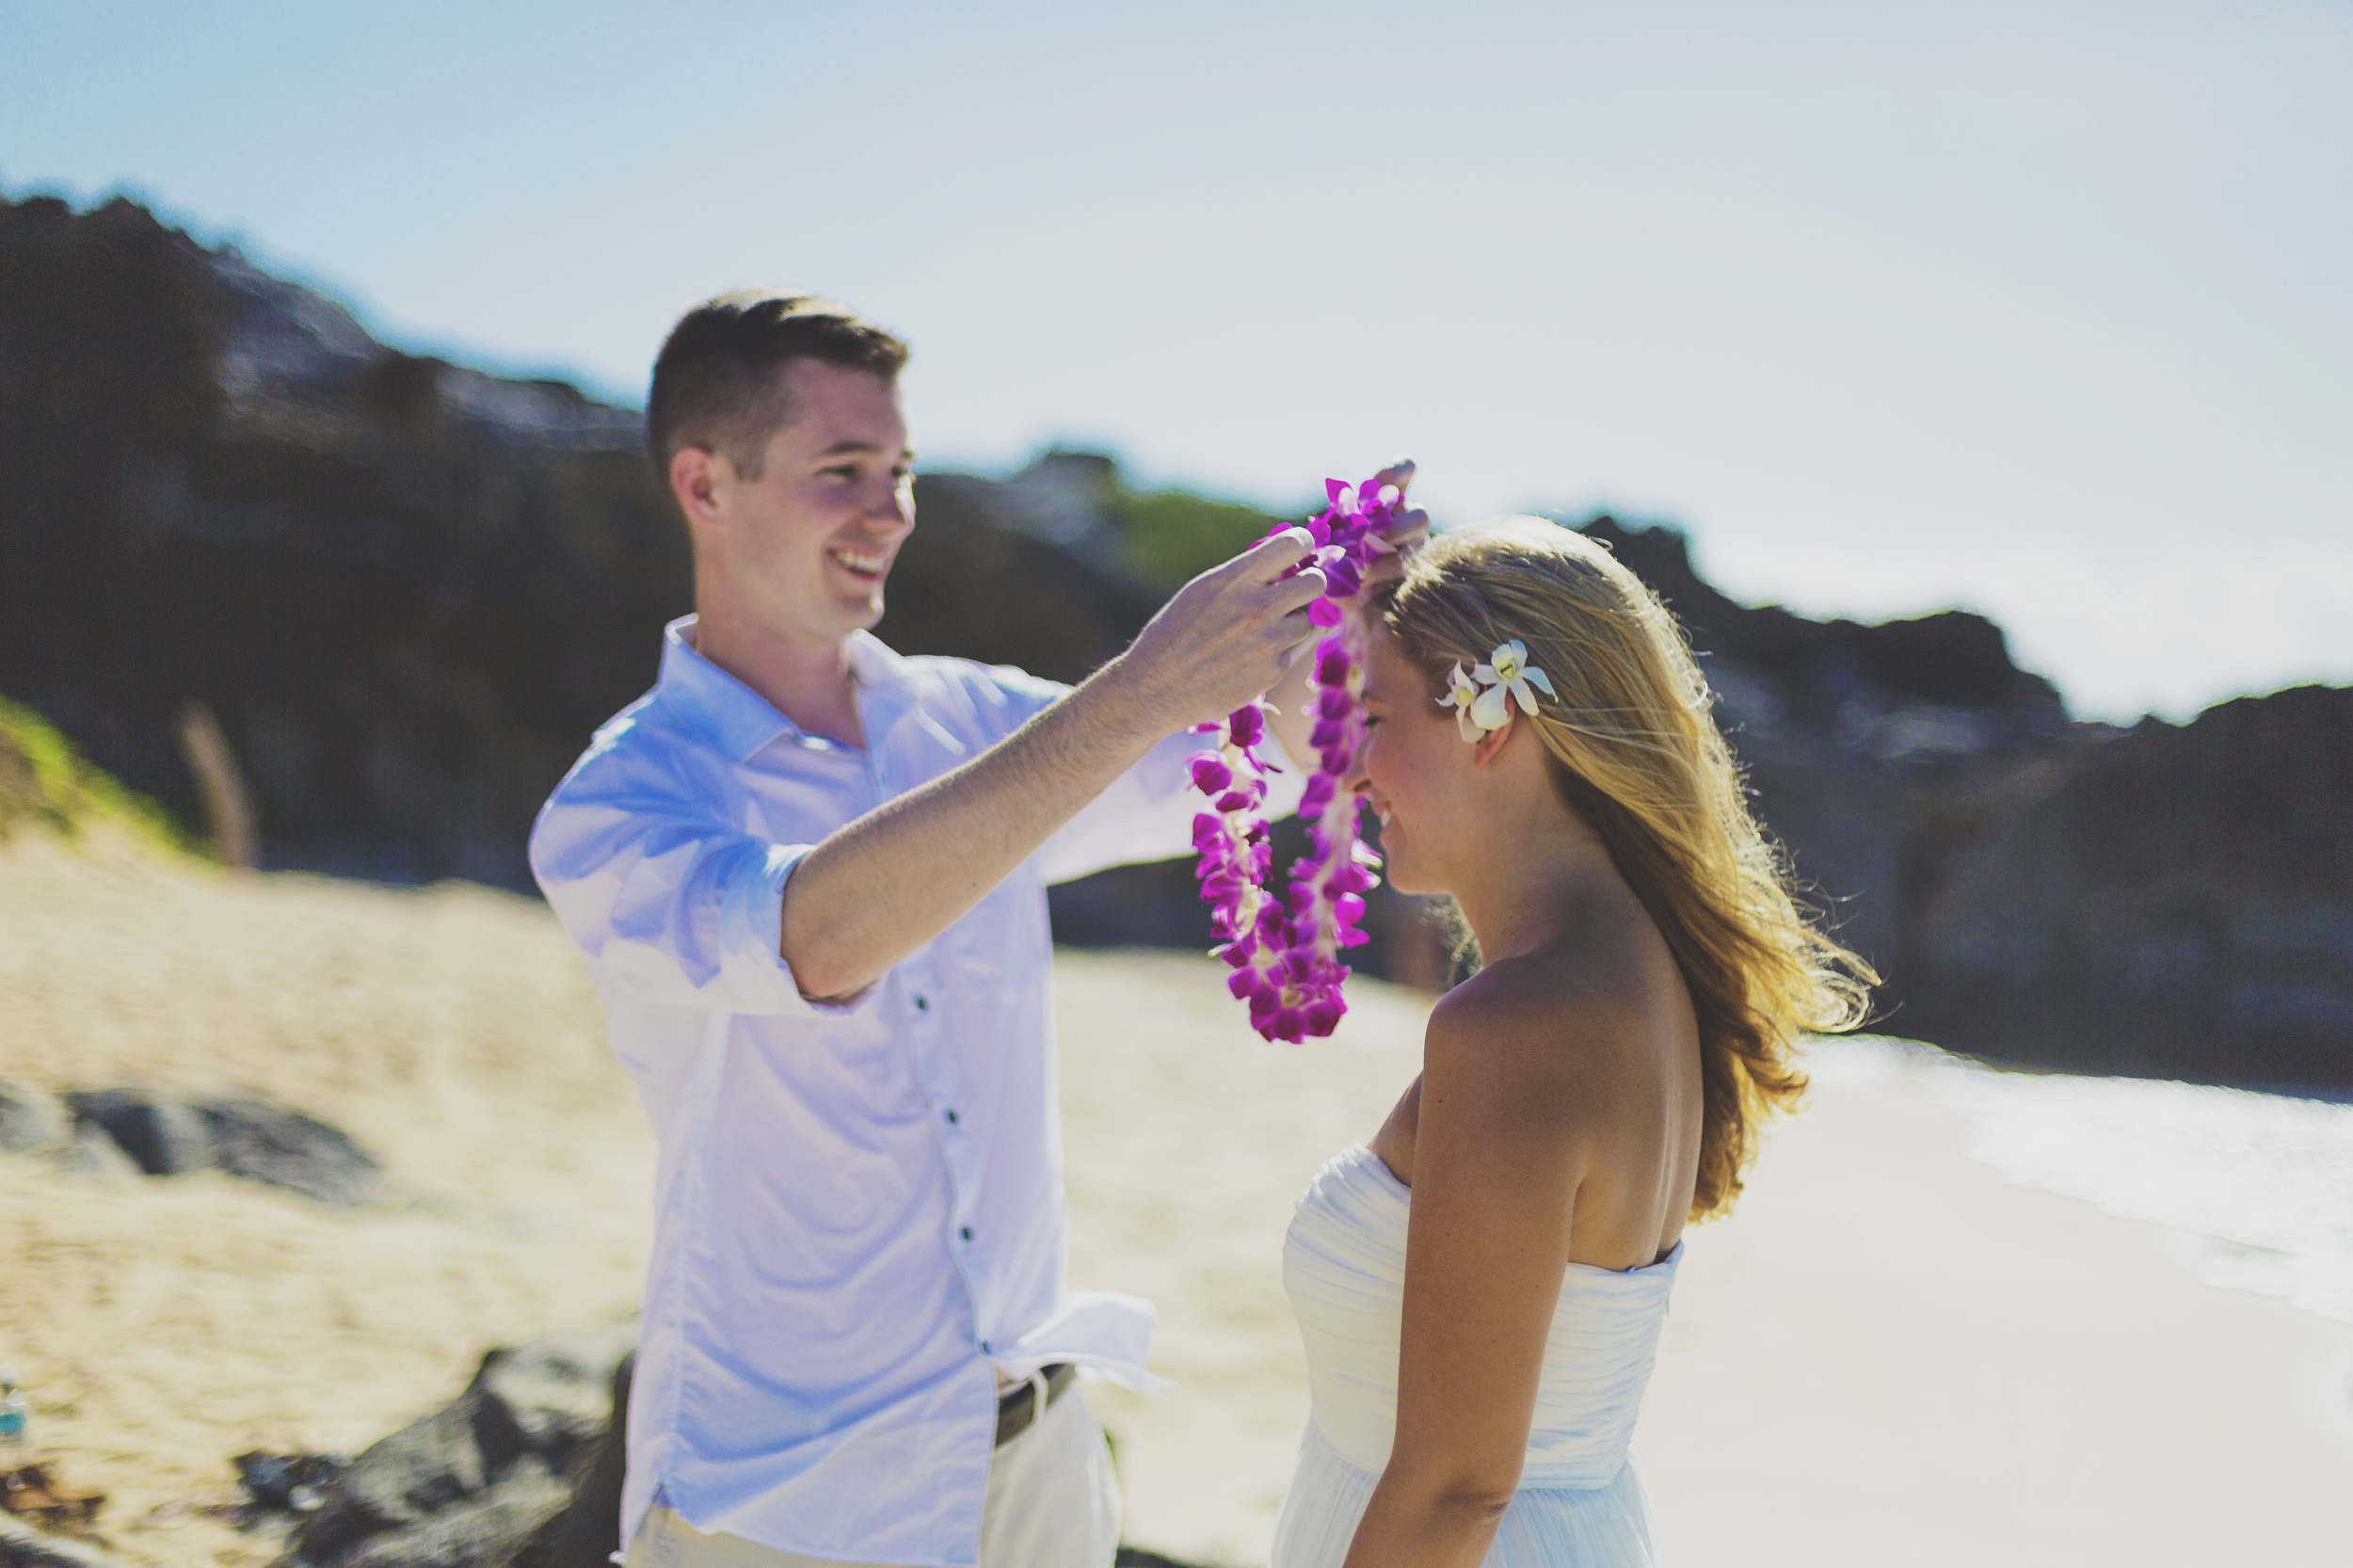 angie-diaz-photography-maui-honeymoon-hawaii-elopement-2.jpg